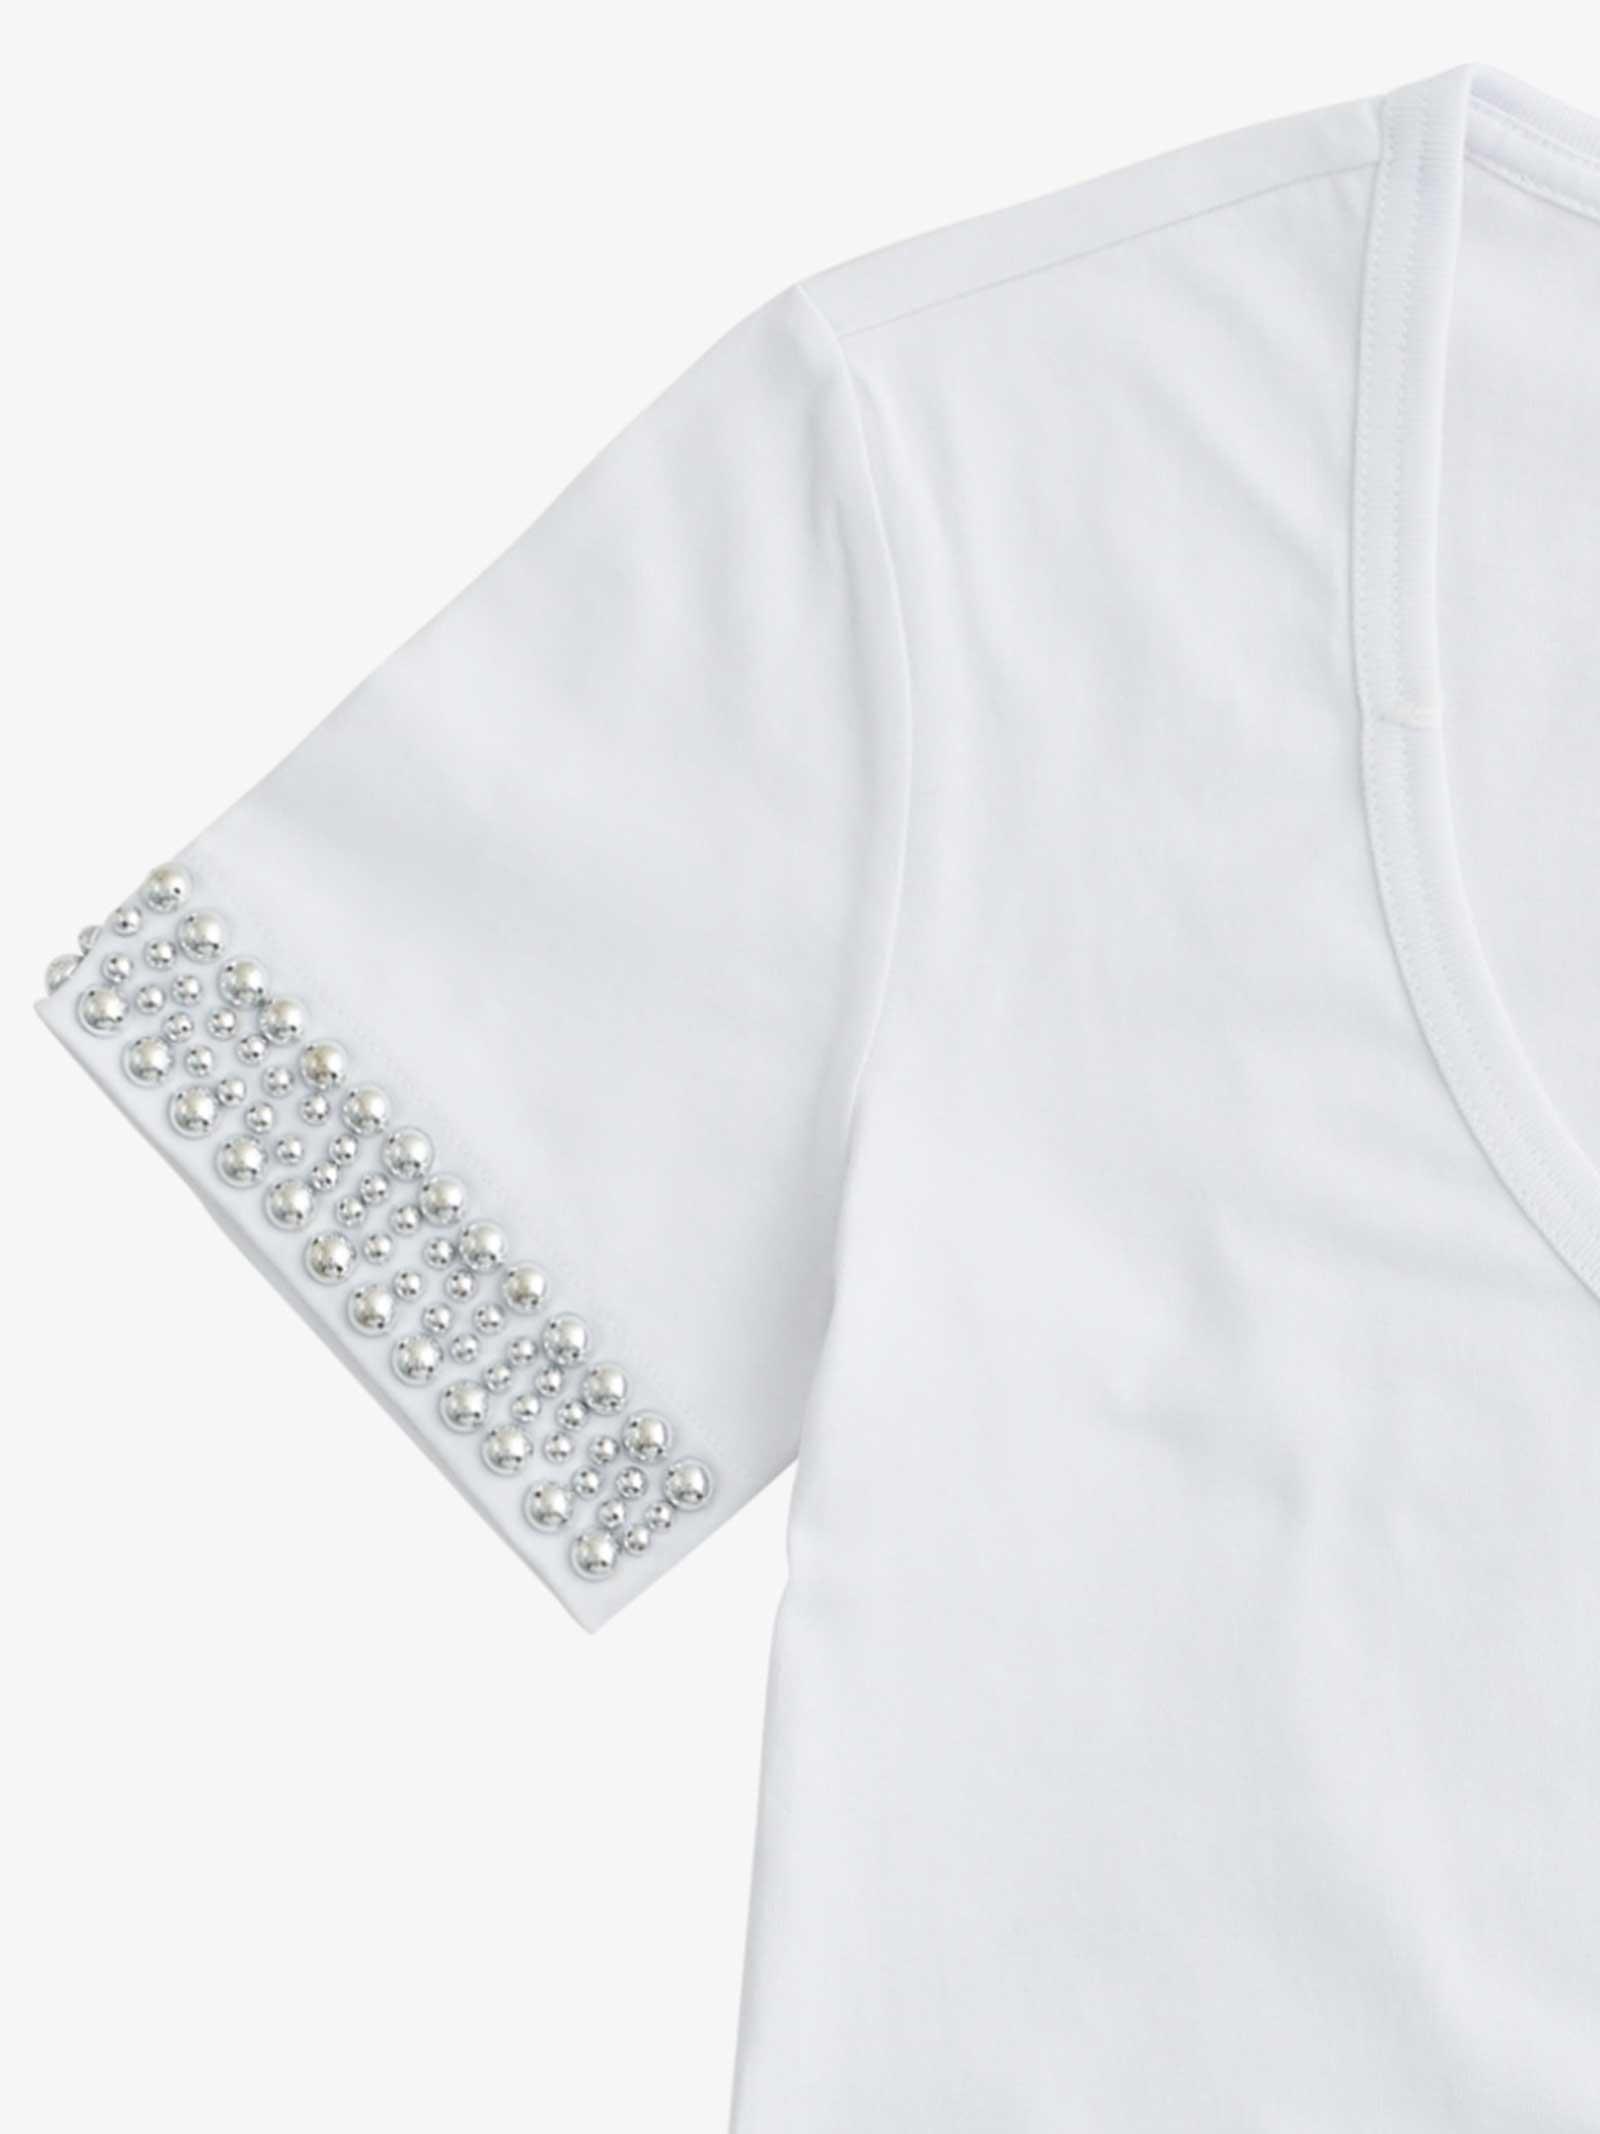 T-SHIRT DONNA SUN68 | T-shirt | T3120301